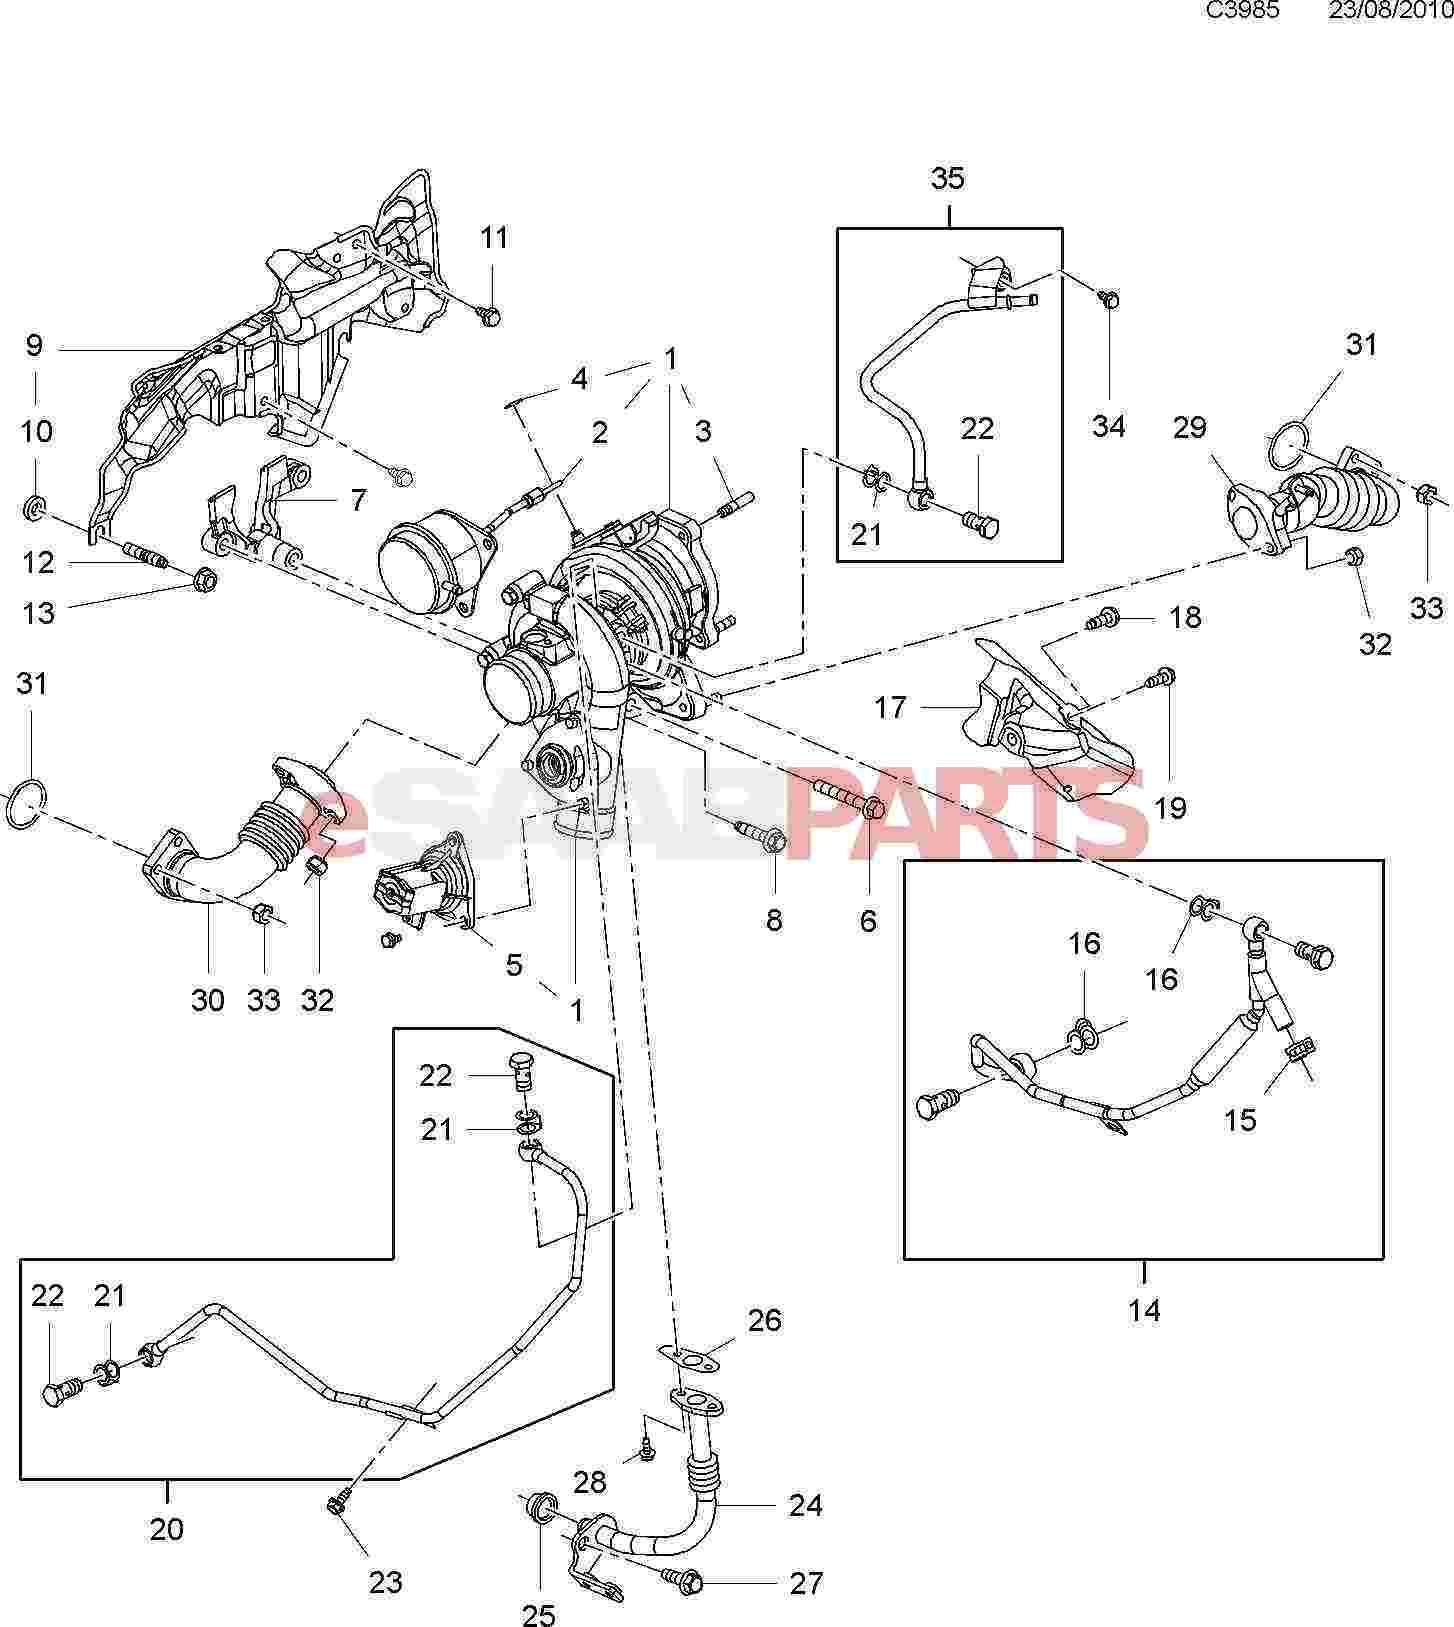 diagram along with 2003 saab 9 3 headlight wiring diagram wiring